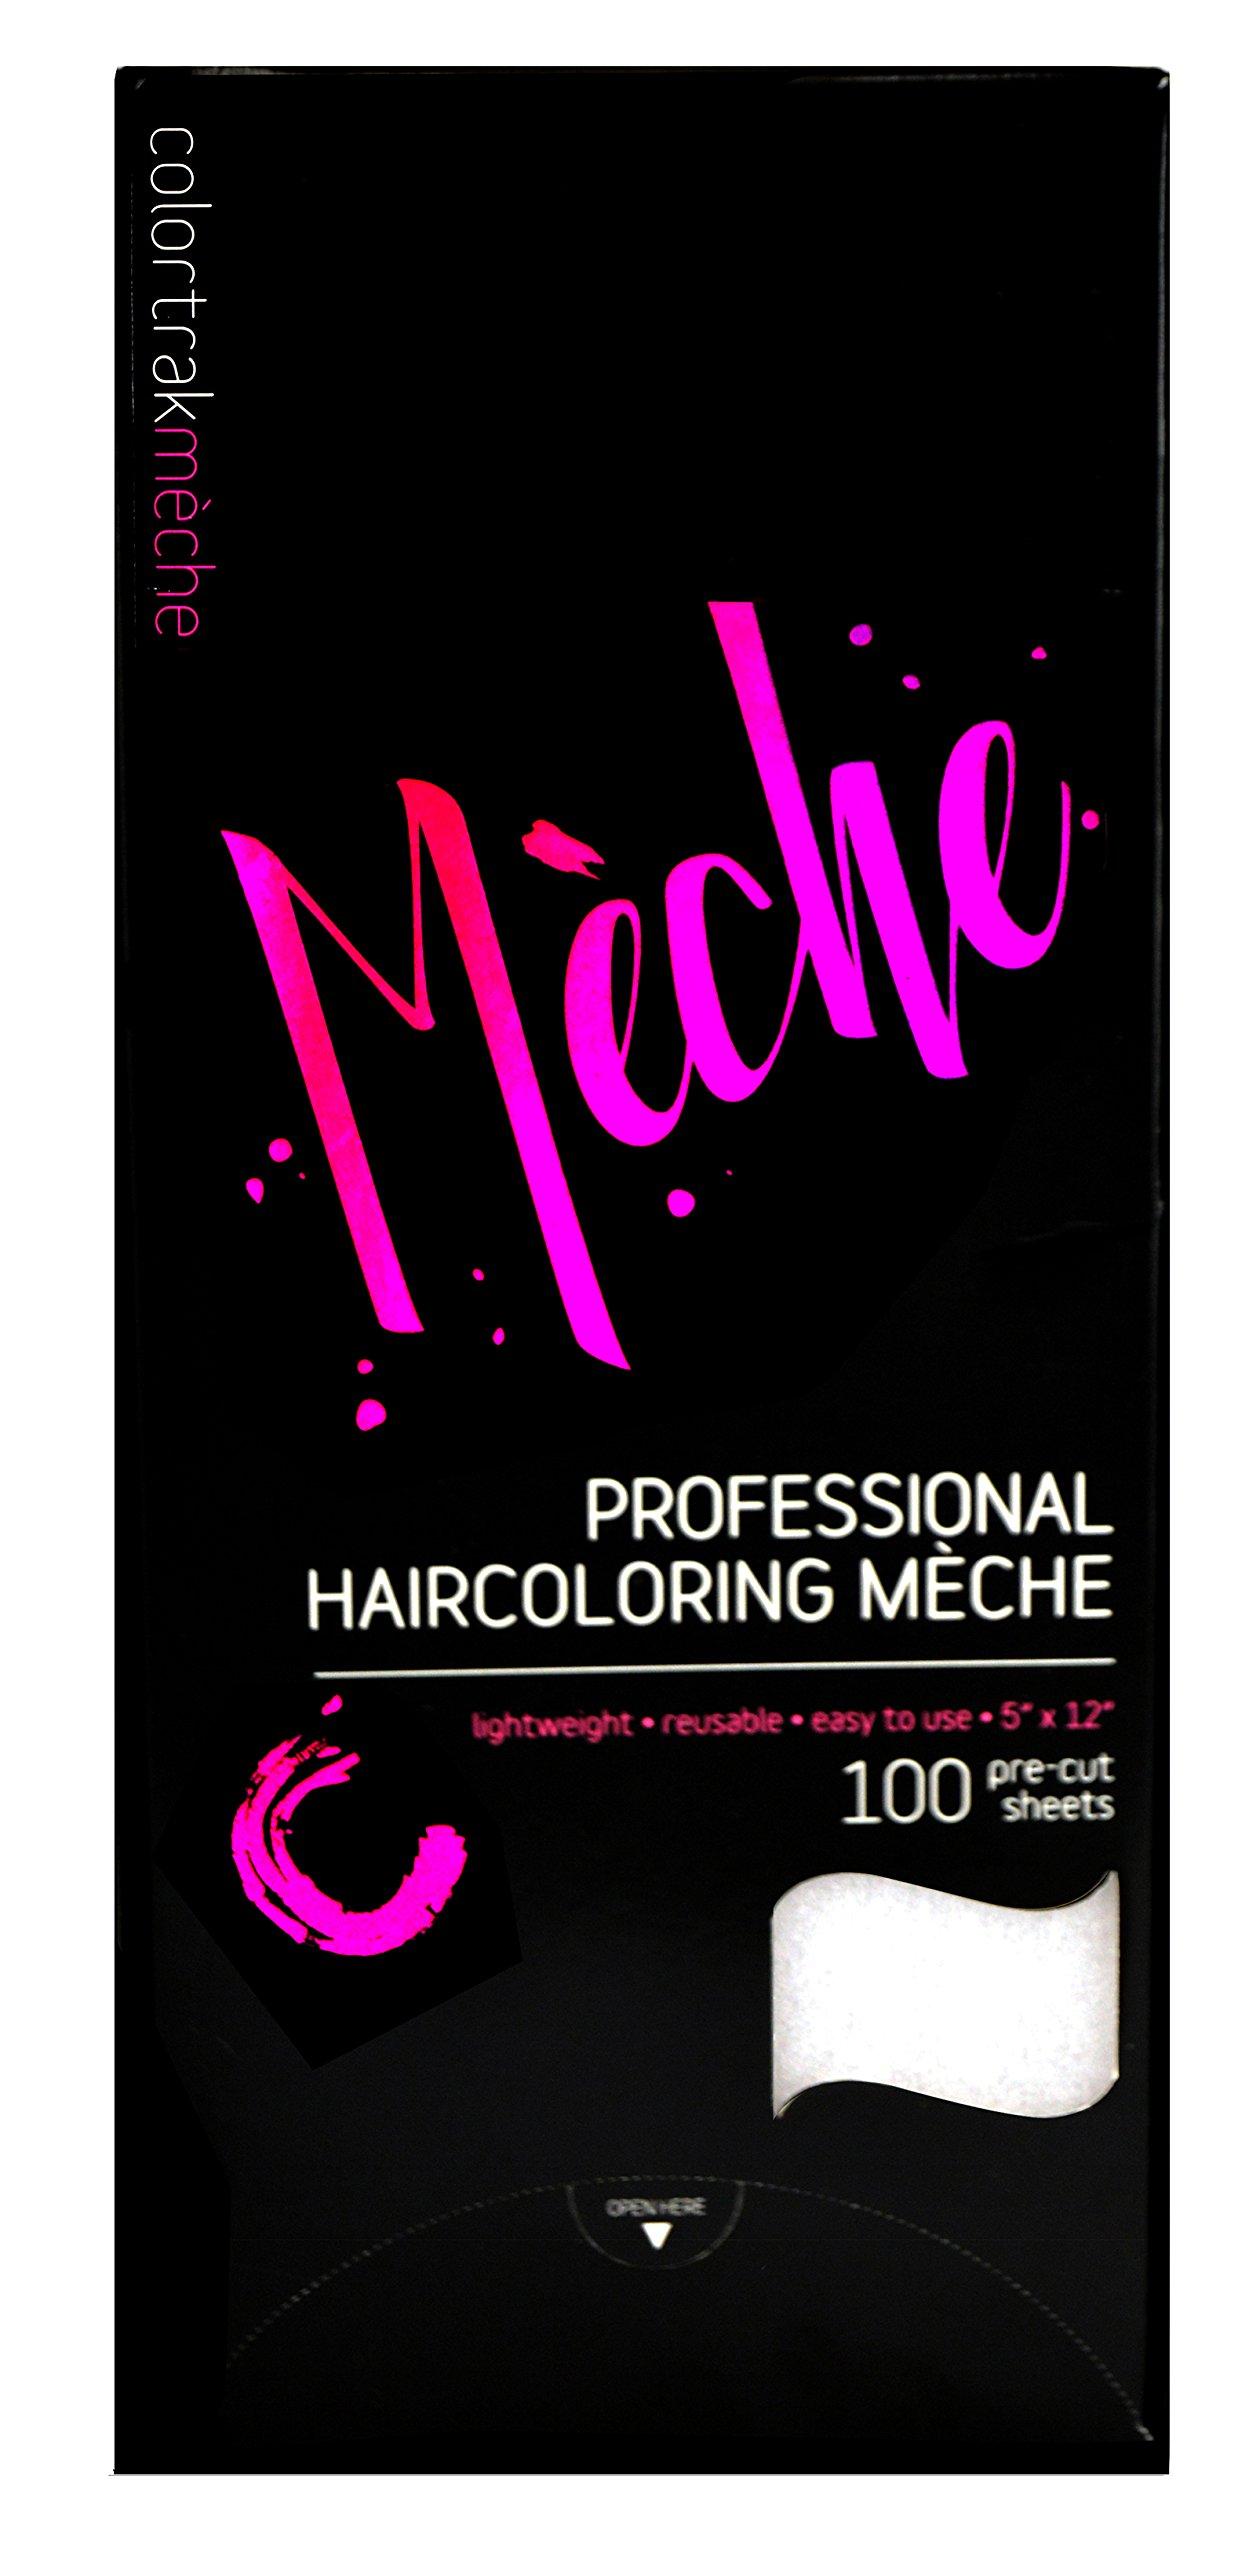 Colortrak Professional Reusable Hair Coloring Meche Sheets, Standard 5'' x 12'' Size (100 Count)